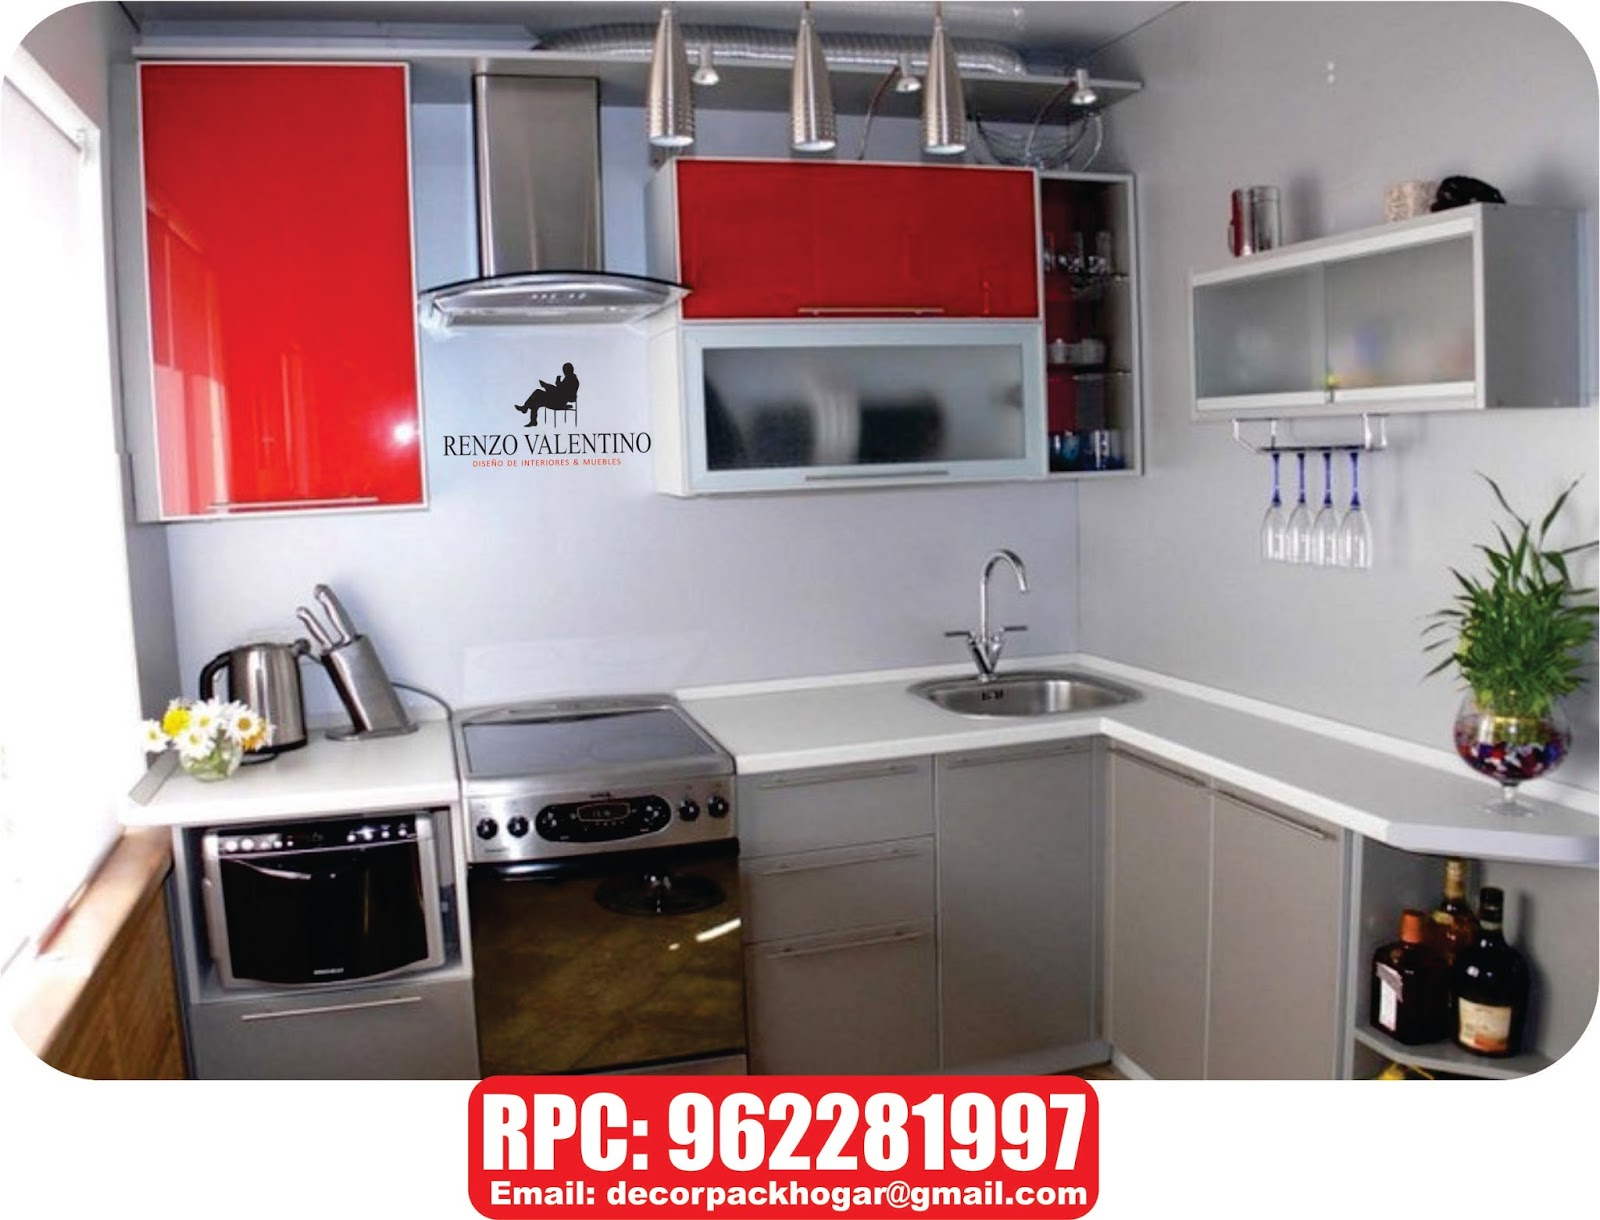 Dise os fabricacion de closet cocina y muebles de oficina for Muebles de cocina basicos